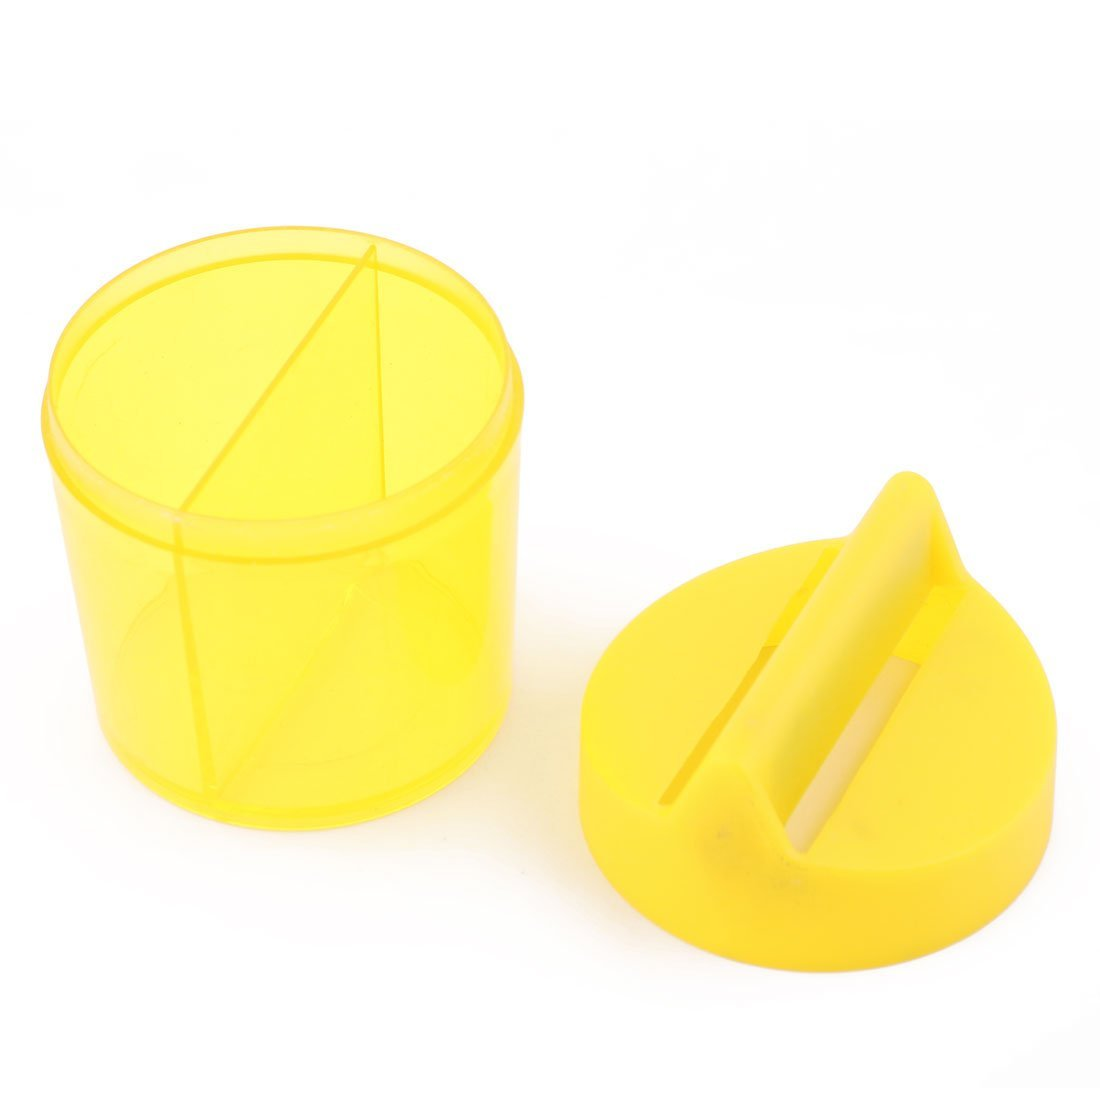 Amazon.com : DealMux Plastic Office Student forma redonda Paper Clip Dispenser Titular Box 2pcs Azul Amarelo : Office Products